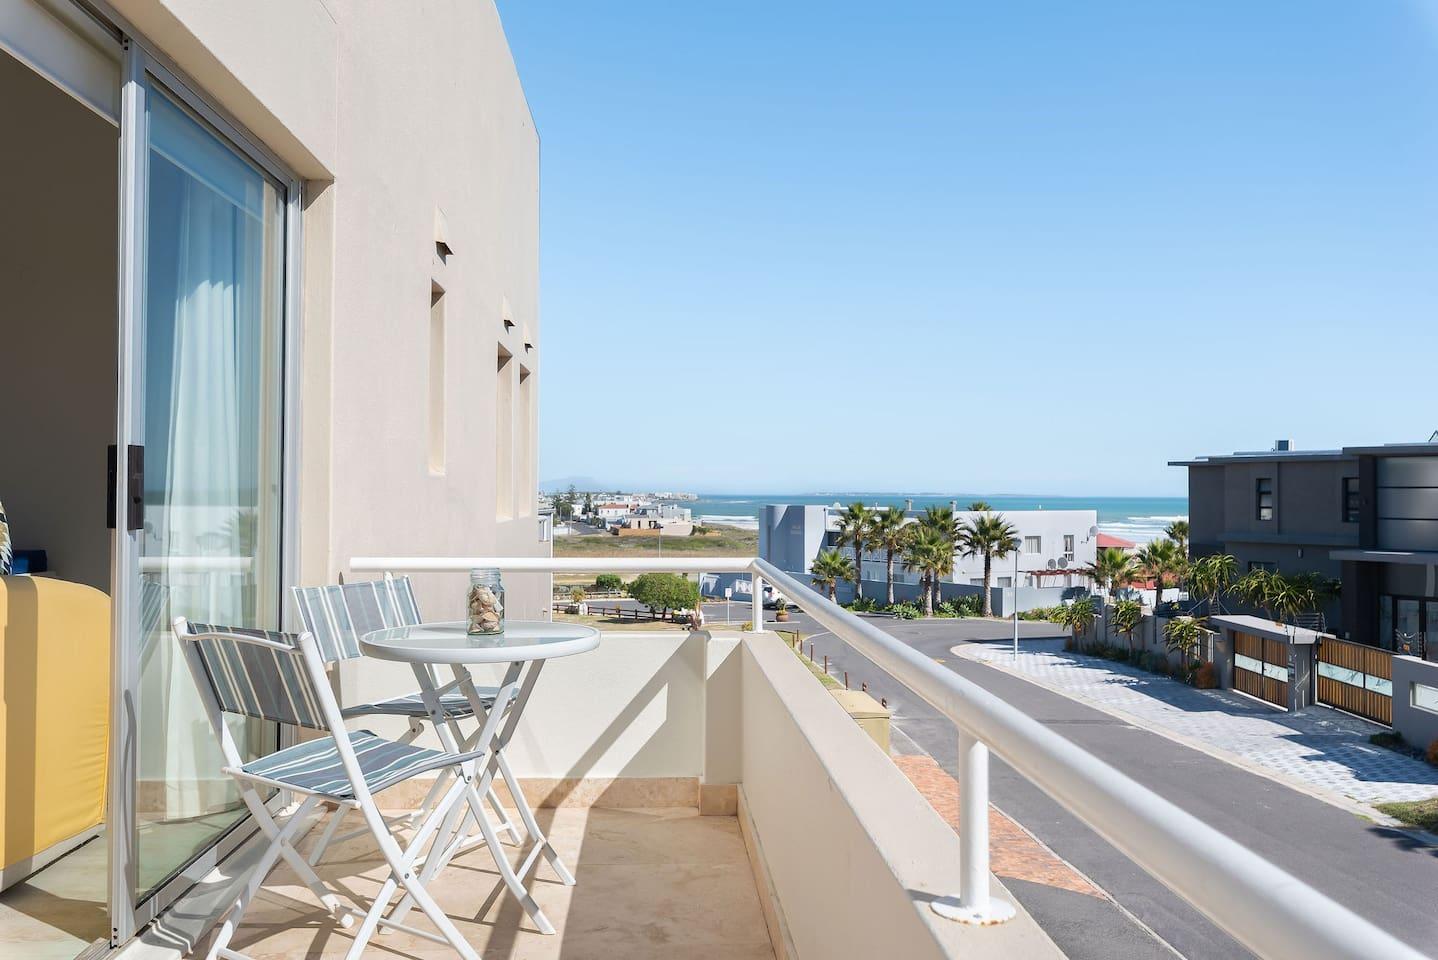 Living Room Balcony, route beach (150m), Robben Island